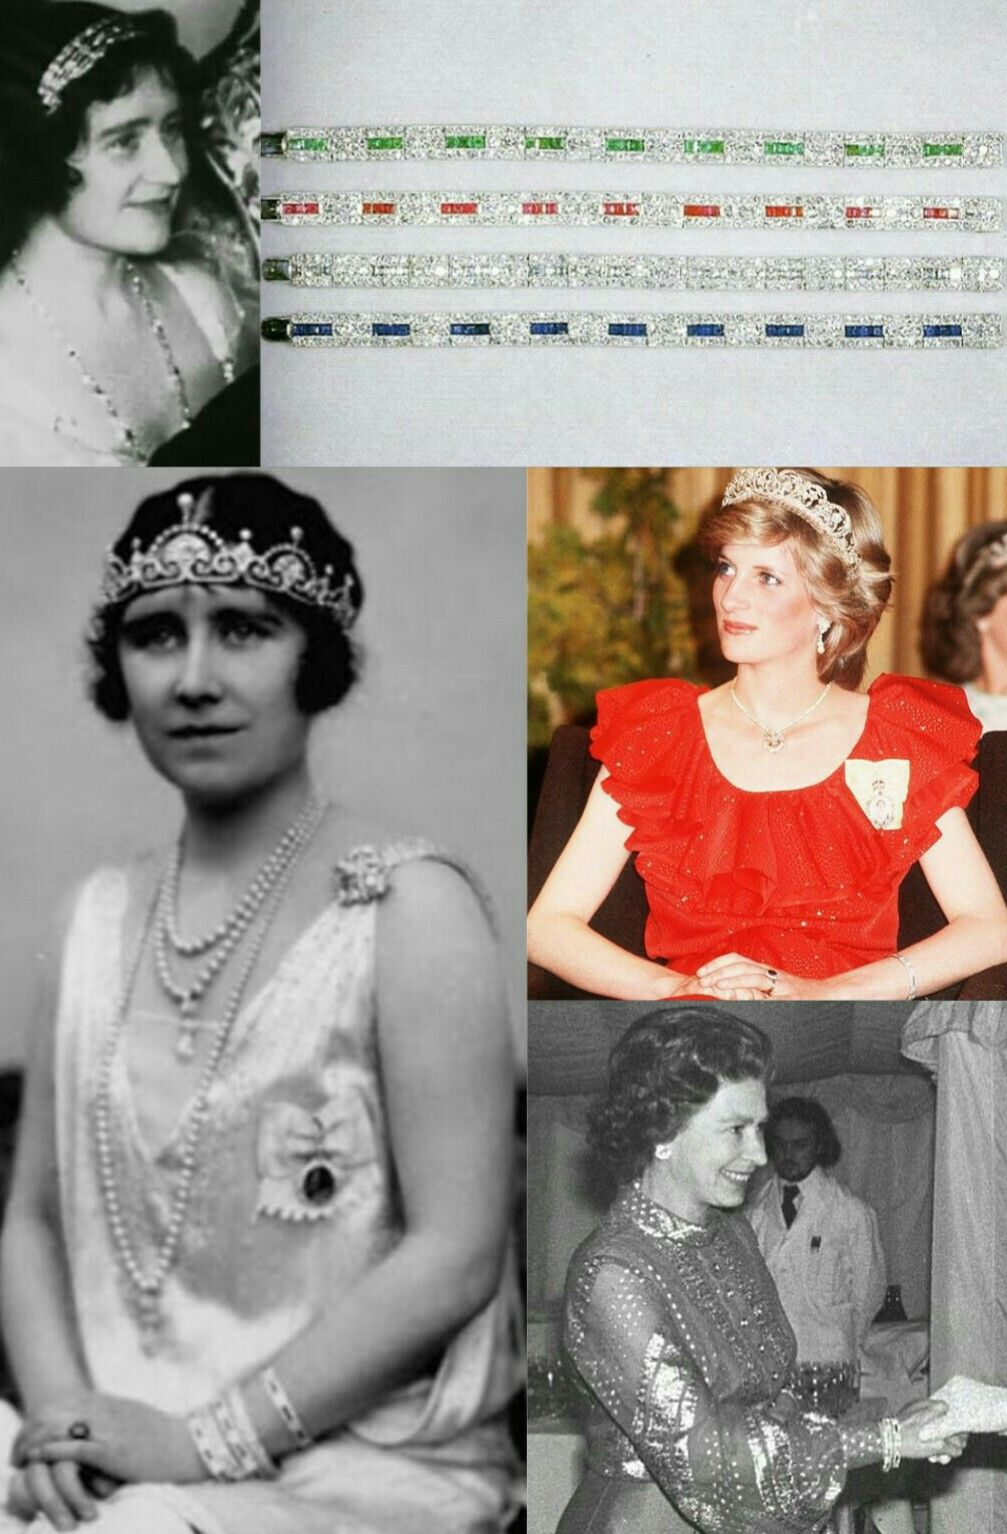 Pulceras Tiara Cartier Lady Elizabeth Bowes Lyon Reina Elizabeth Del Reino Unido Reina Elizabeth Ii Del Reino Queen Elizabeth Jewels Royal Jewels Royal Tiaras